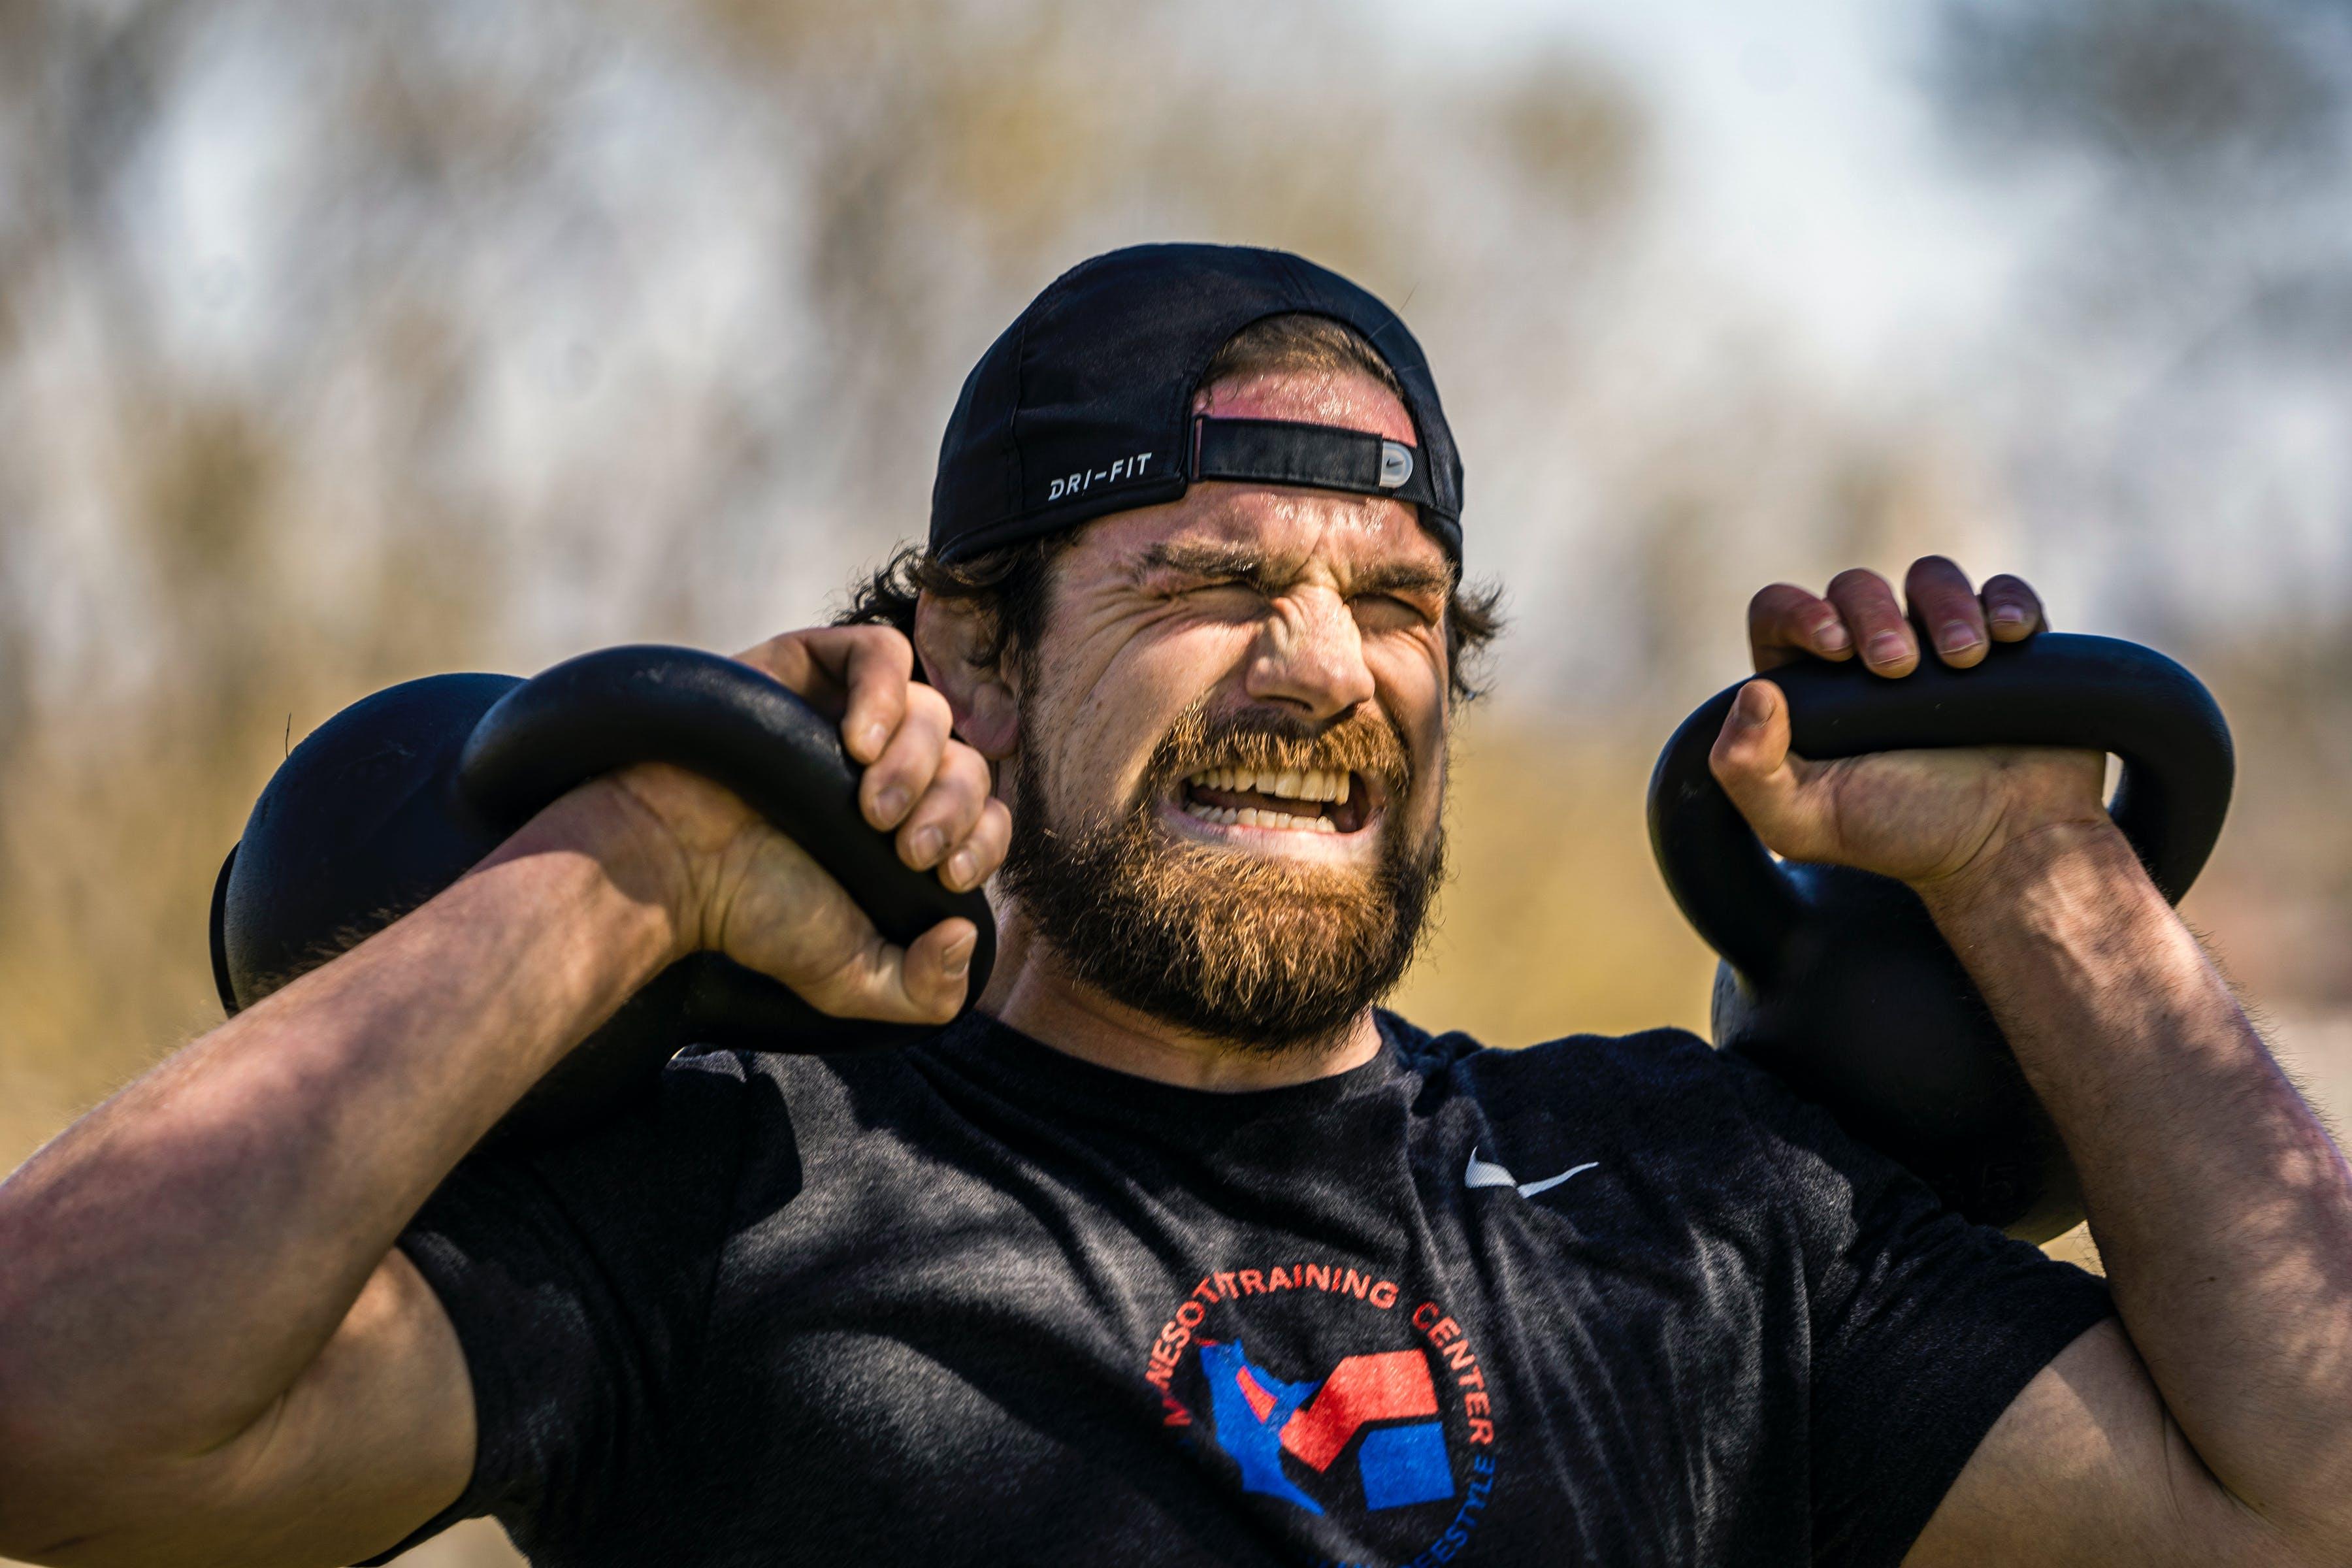 Wrestler Pat Smith of Chaska training last spring.